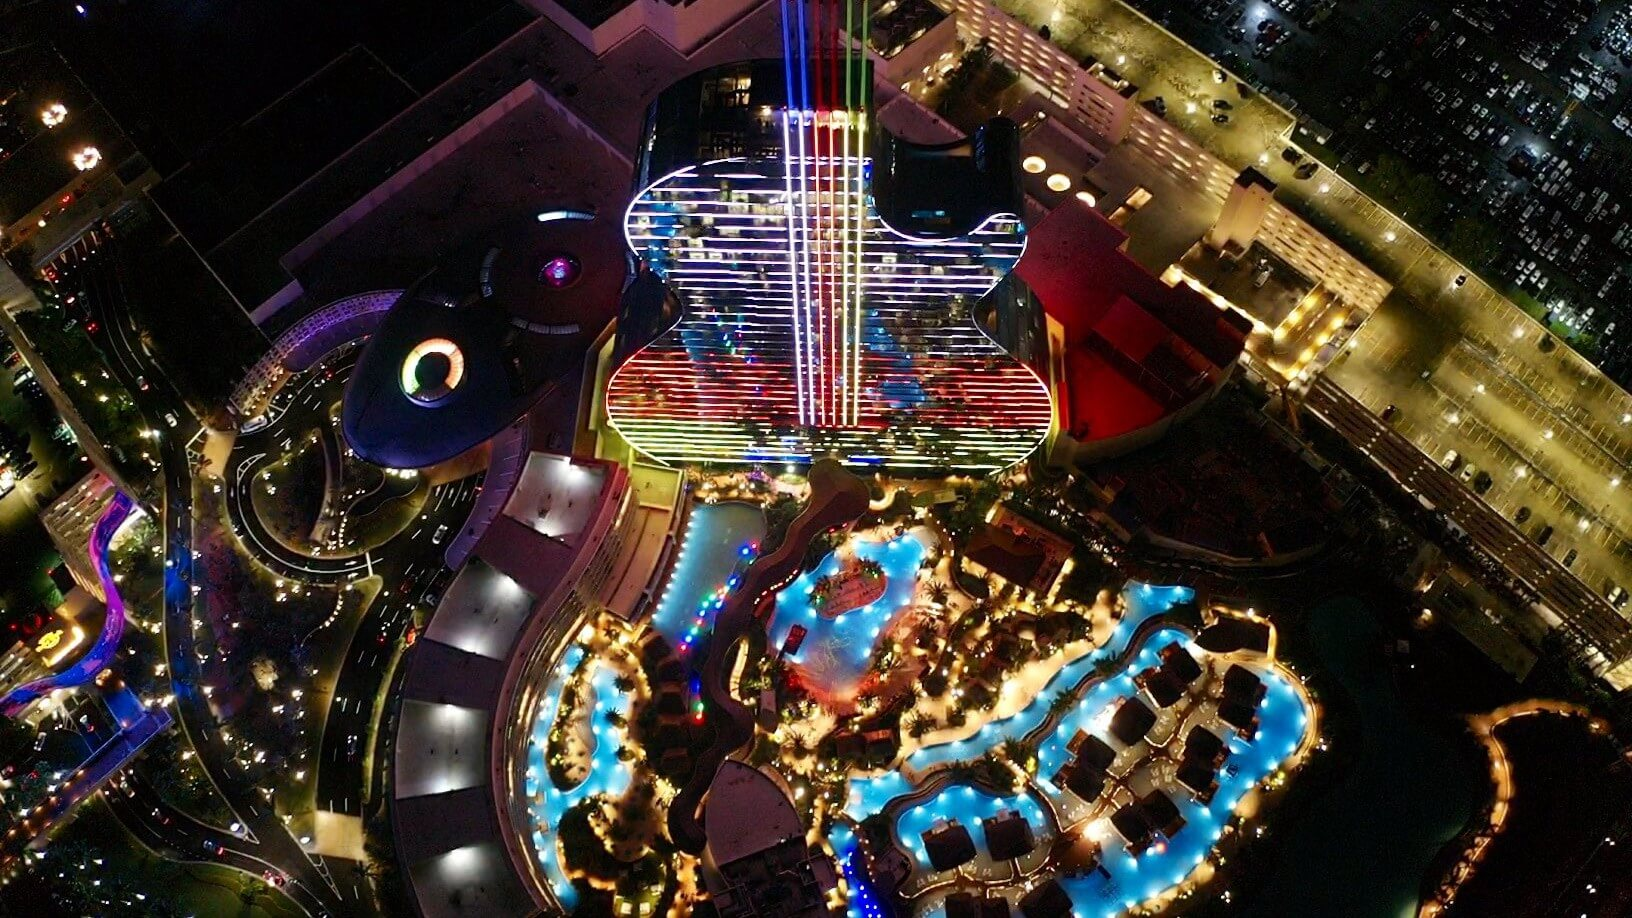 LIGHTS NEW HOTEL HARD ROCK